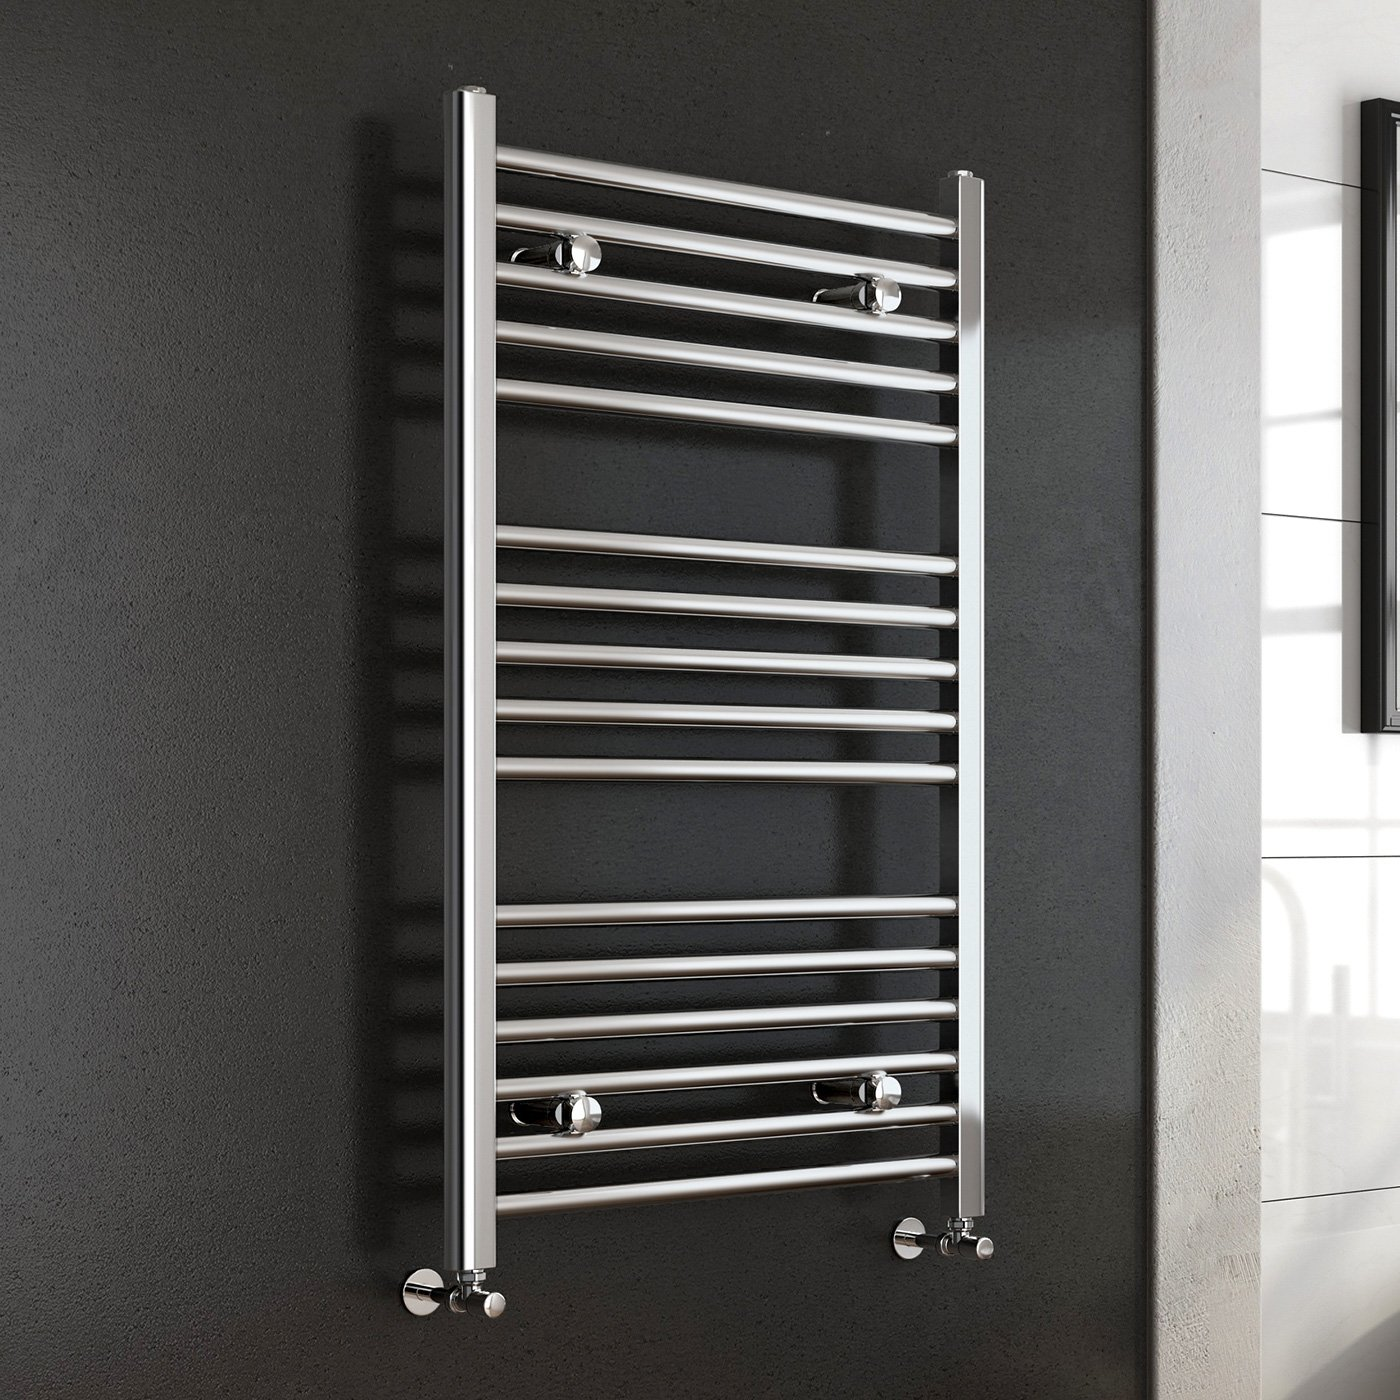 iBathUK 1600 x 600 Premium Straight Heated Towel Rail Chrome Bathroom Radiator